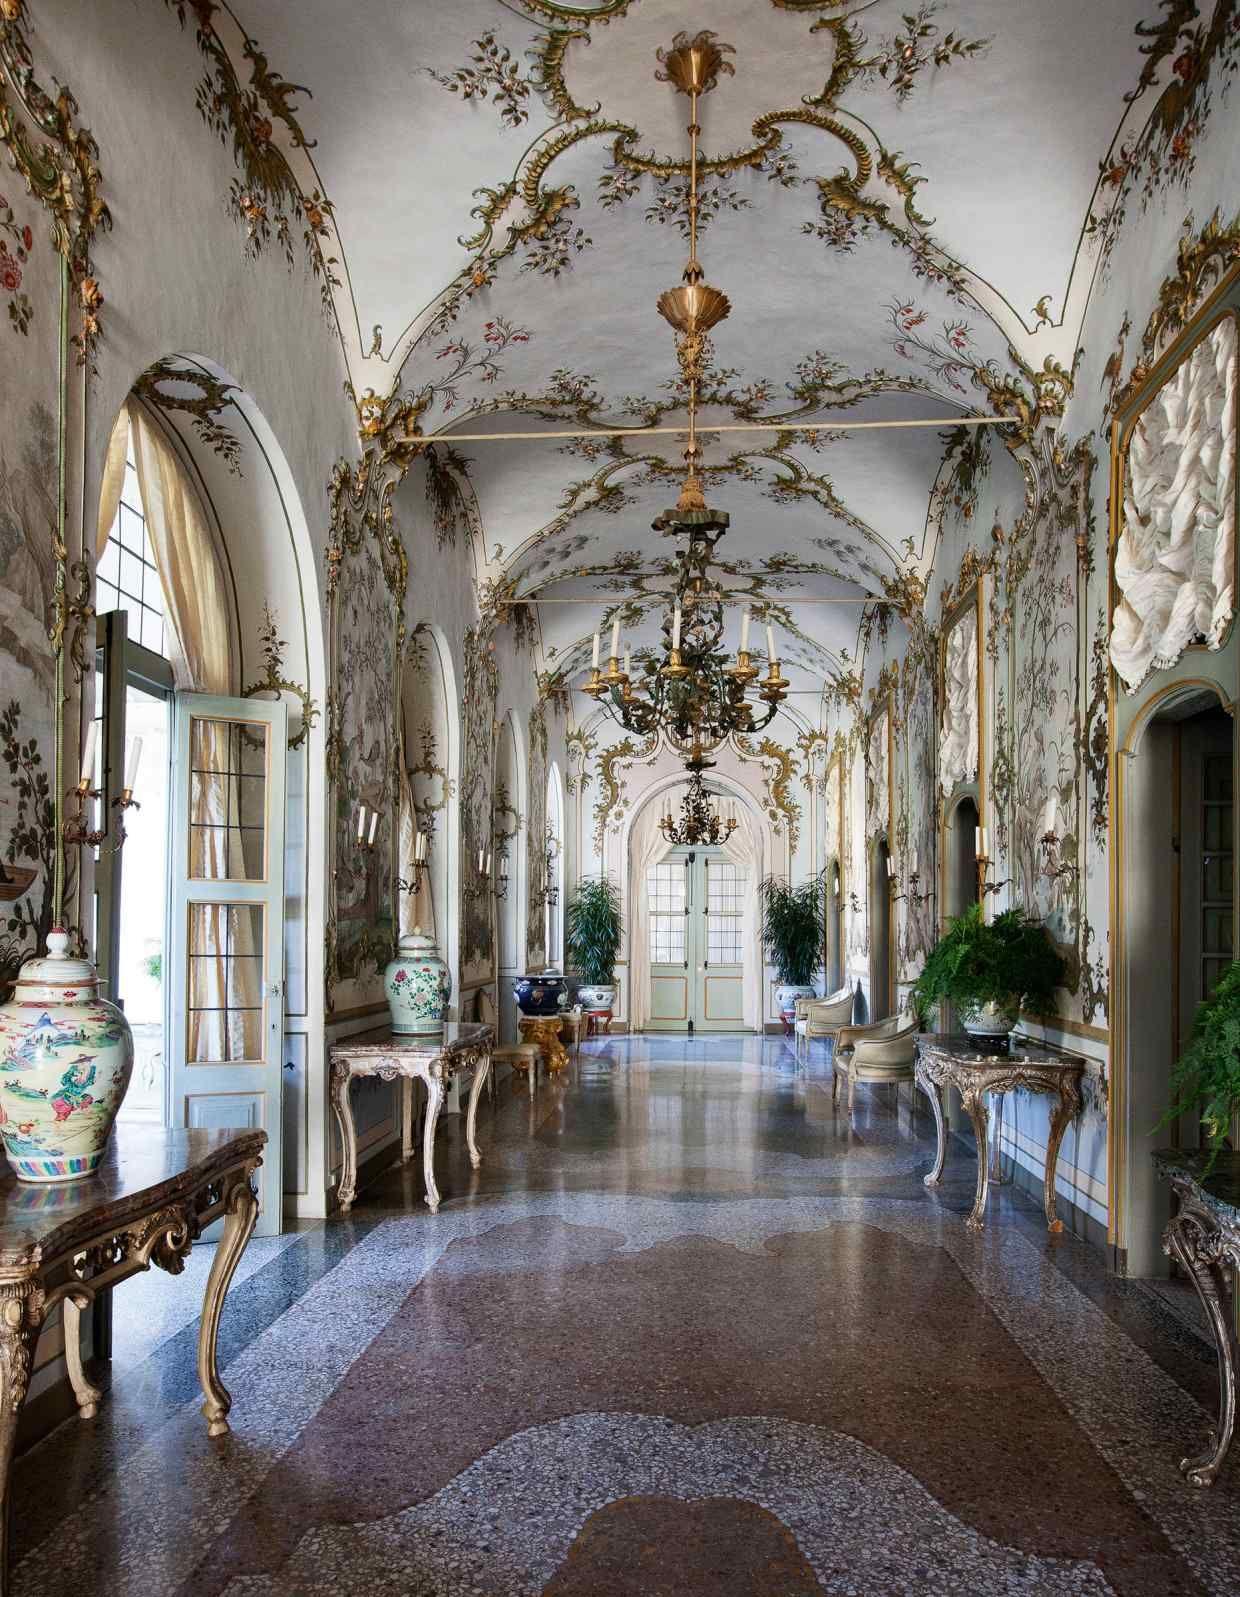 marella agnelli rooms that inspire classic architecture design rh pinterest com